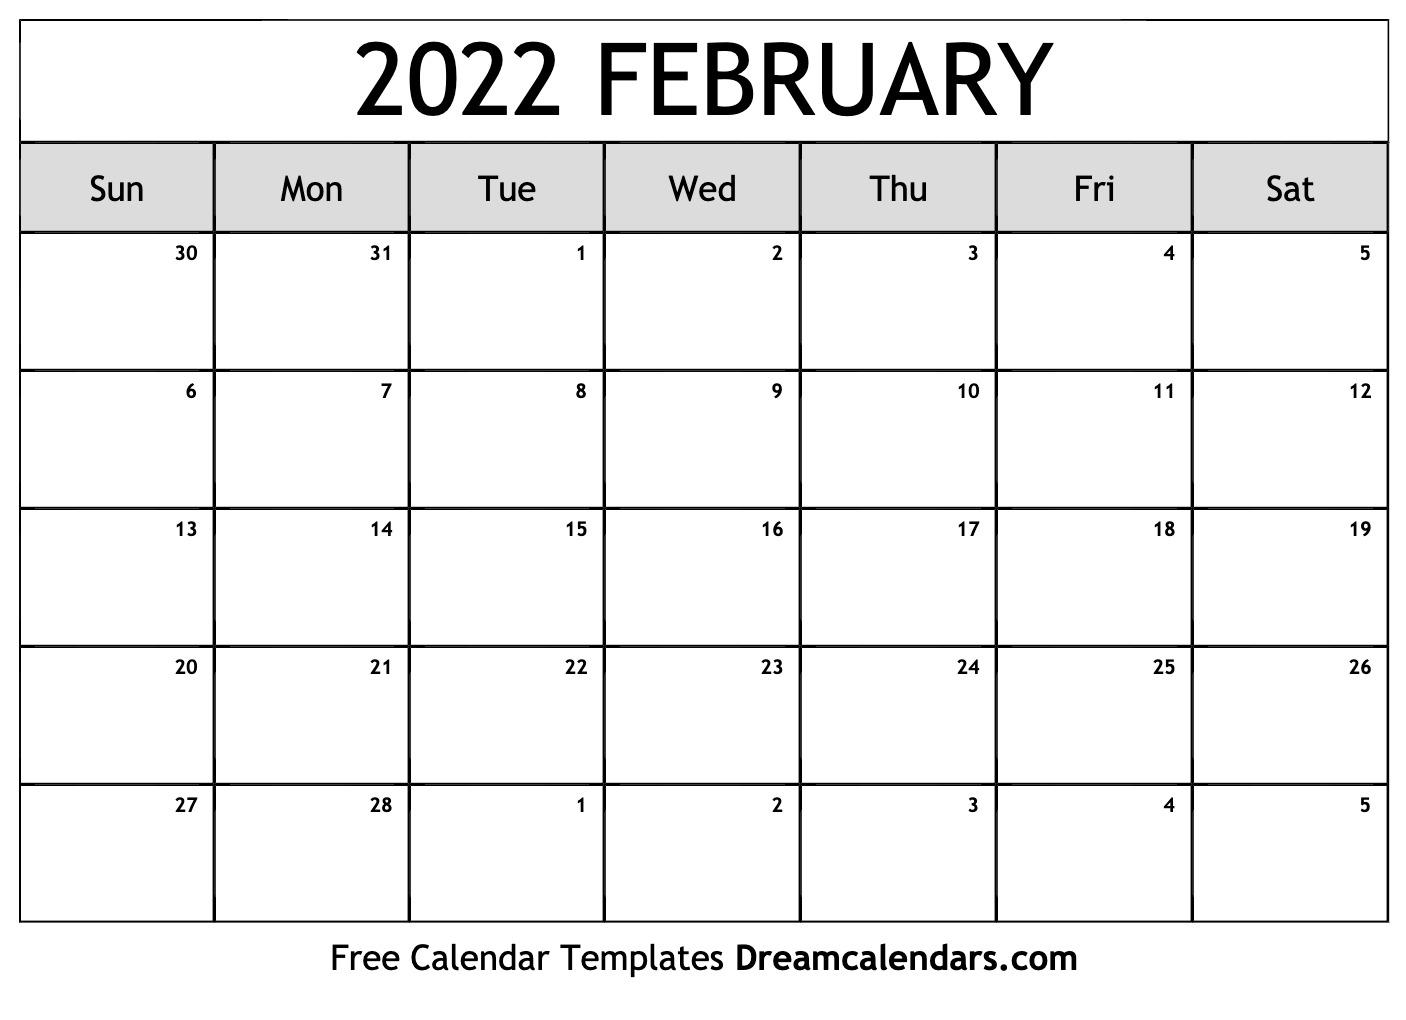 Free Printable Calendar February 2022.February 2022 Calendar Free Blank Printable Templates